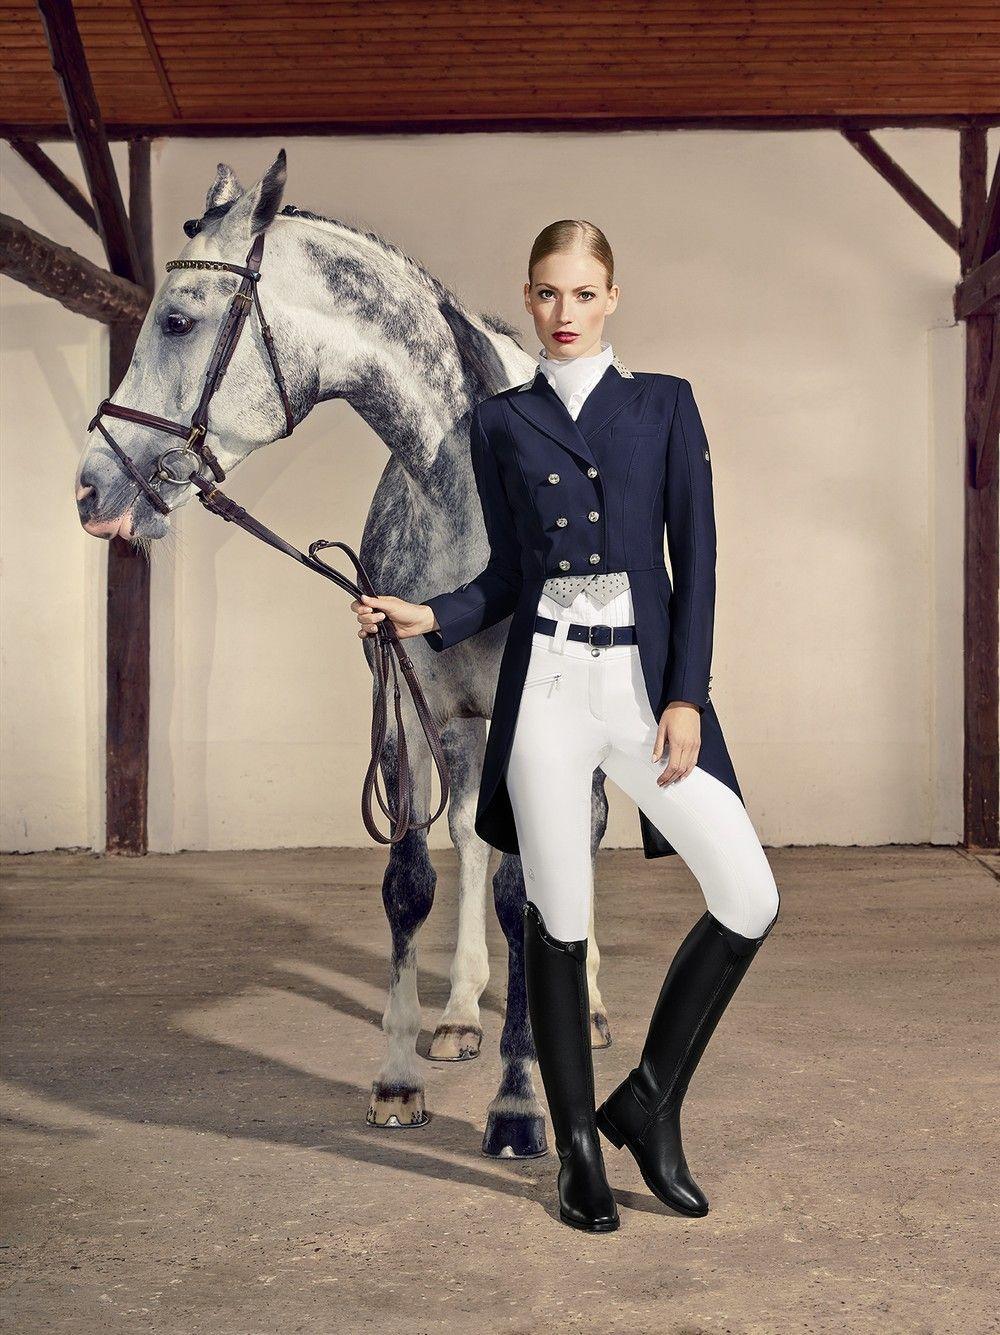 Www Pegasebuzz Com Equestrian Fashion Cavallo Spring